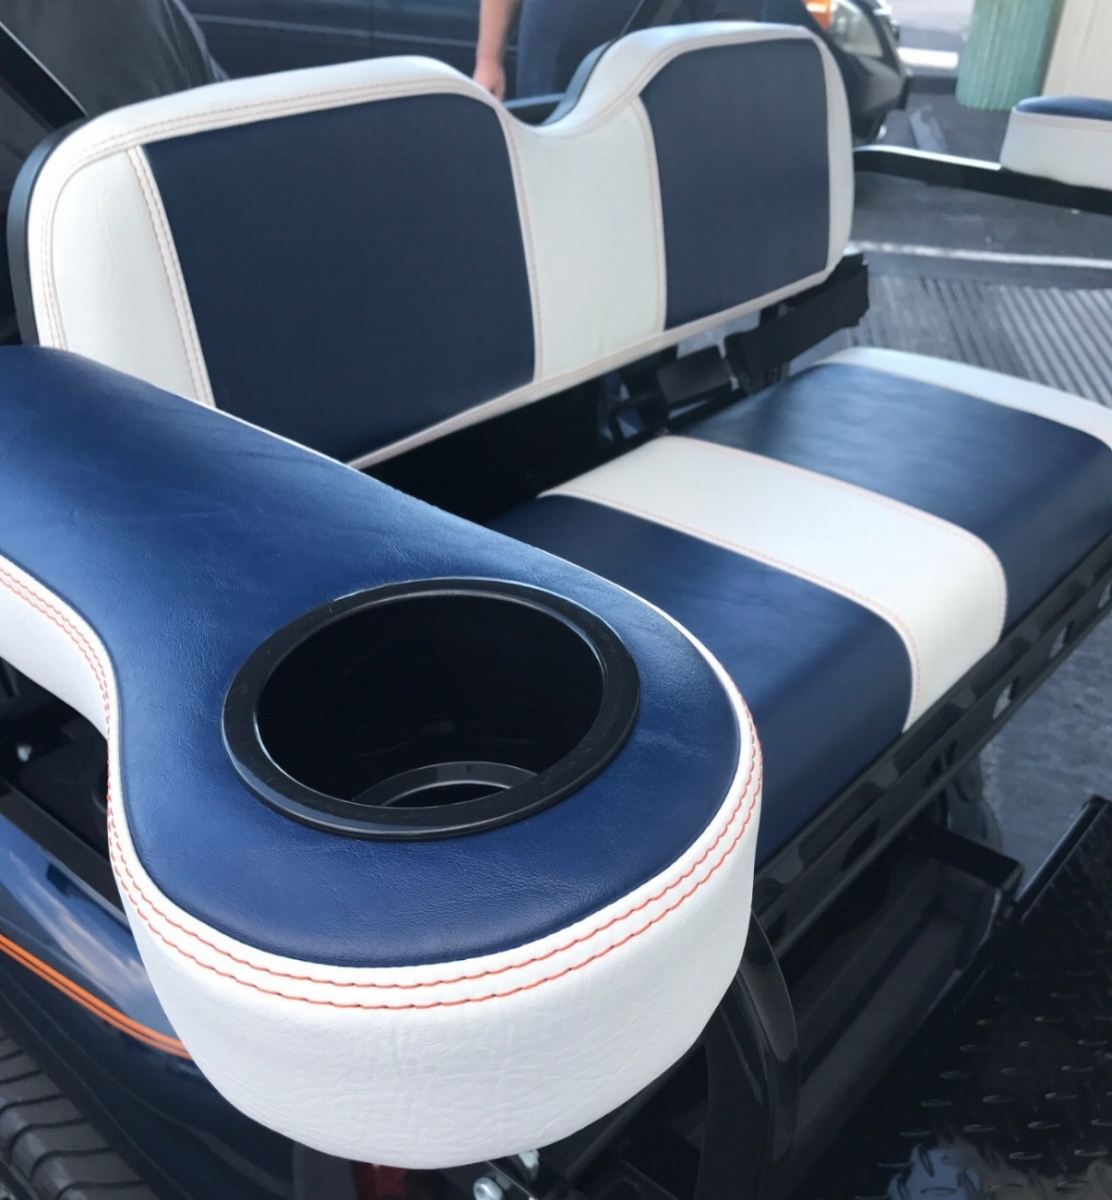 Matching Rear View Seating